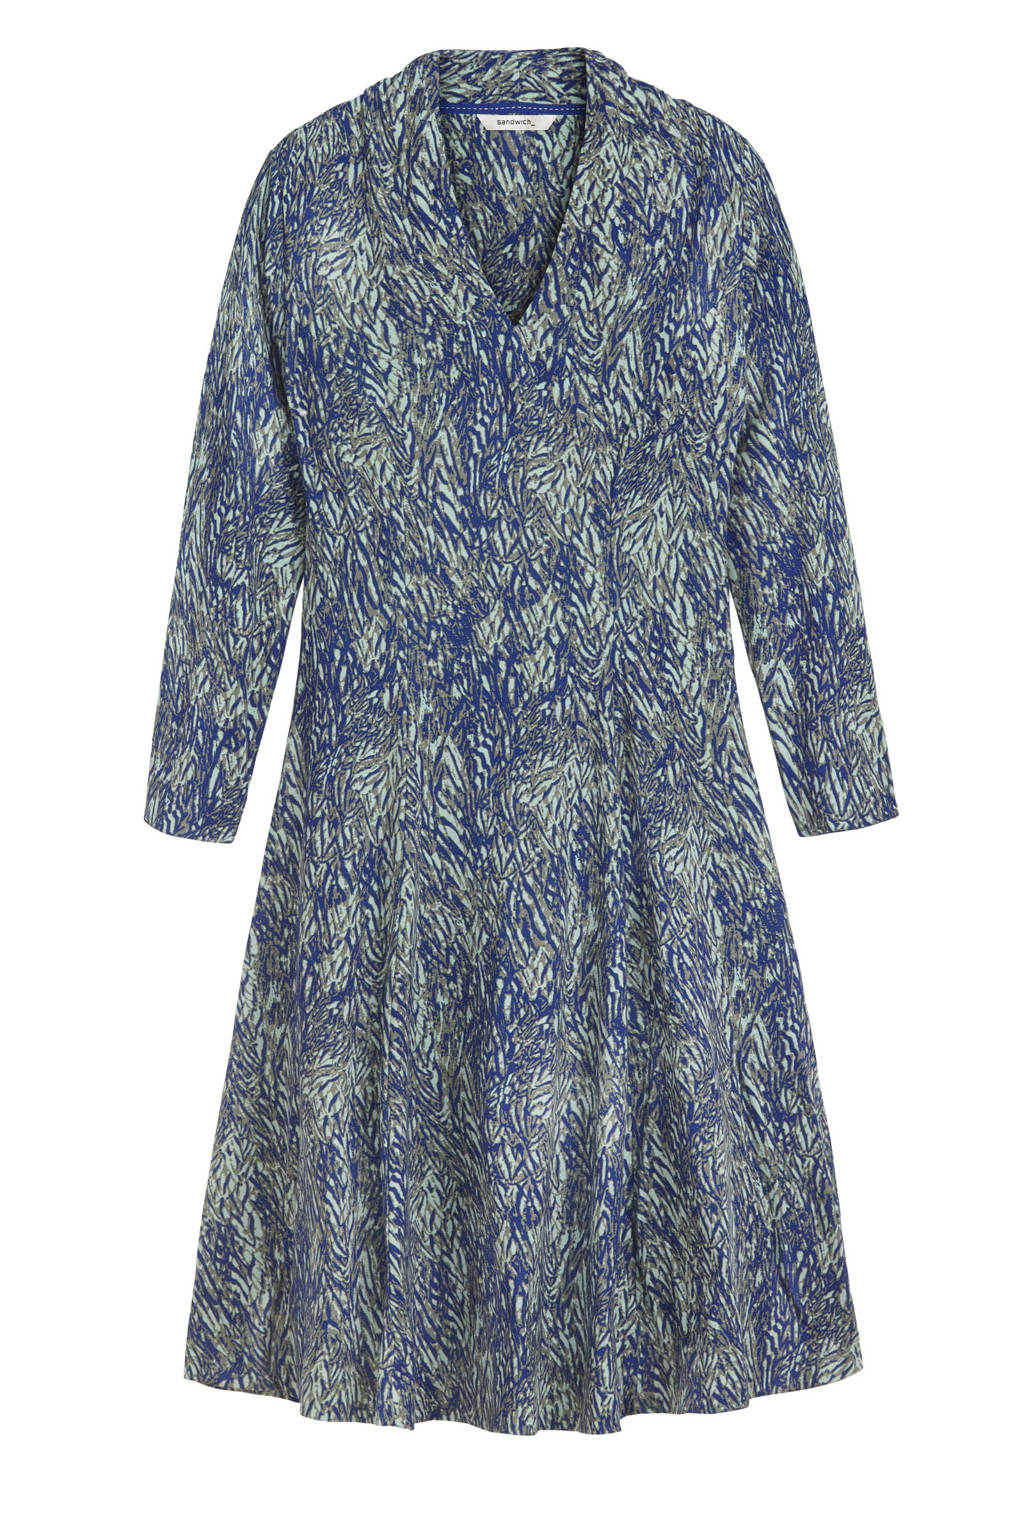 Sandwich A-lijn jurk met all over print blauw/multi, Blauw/multi